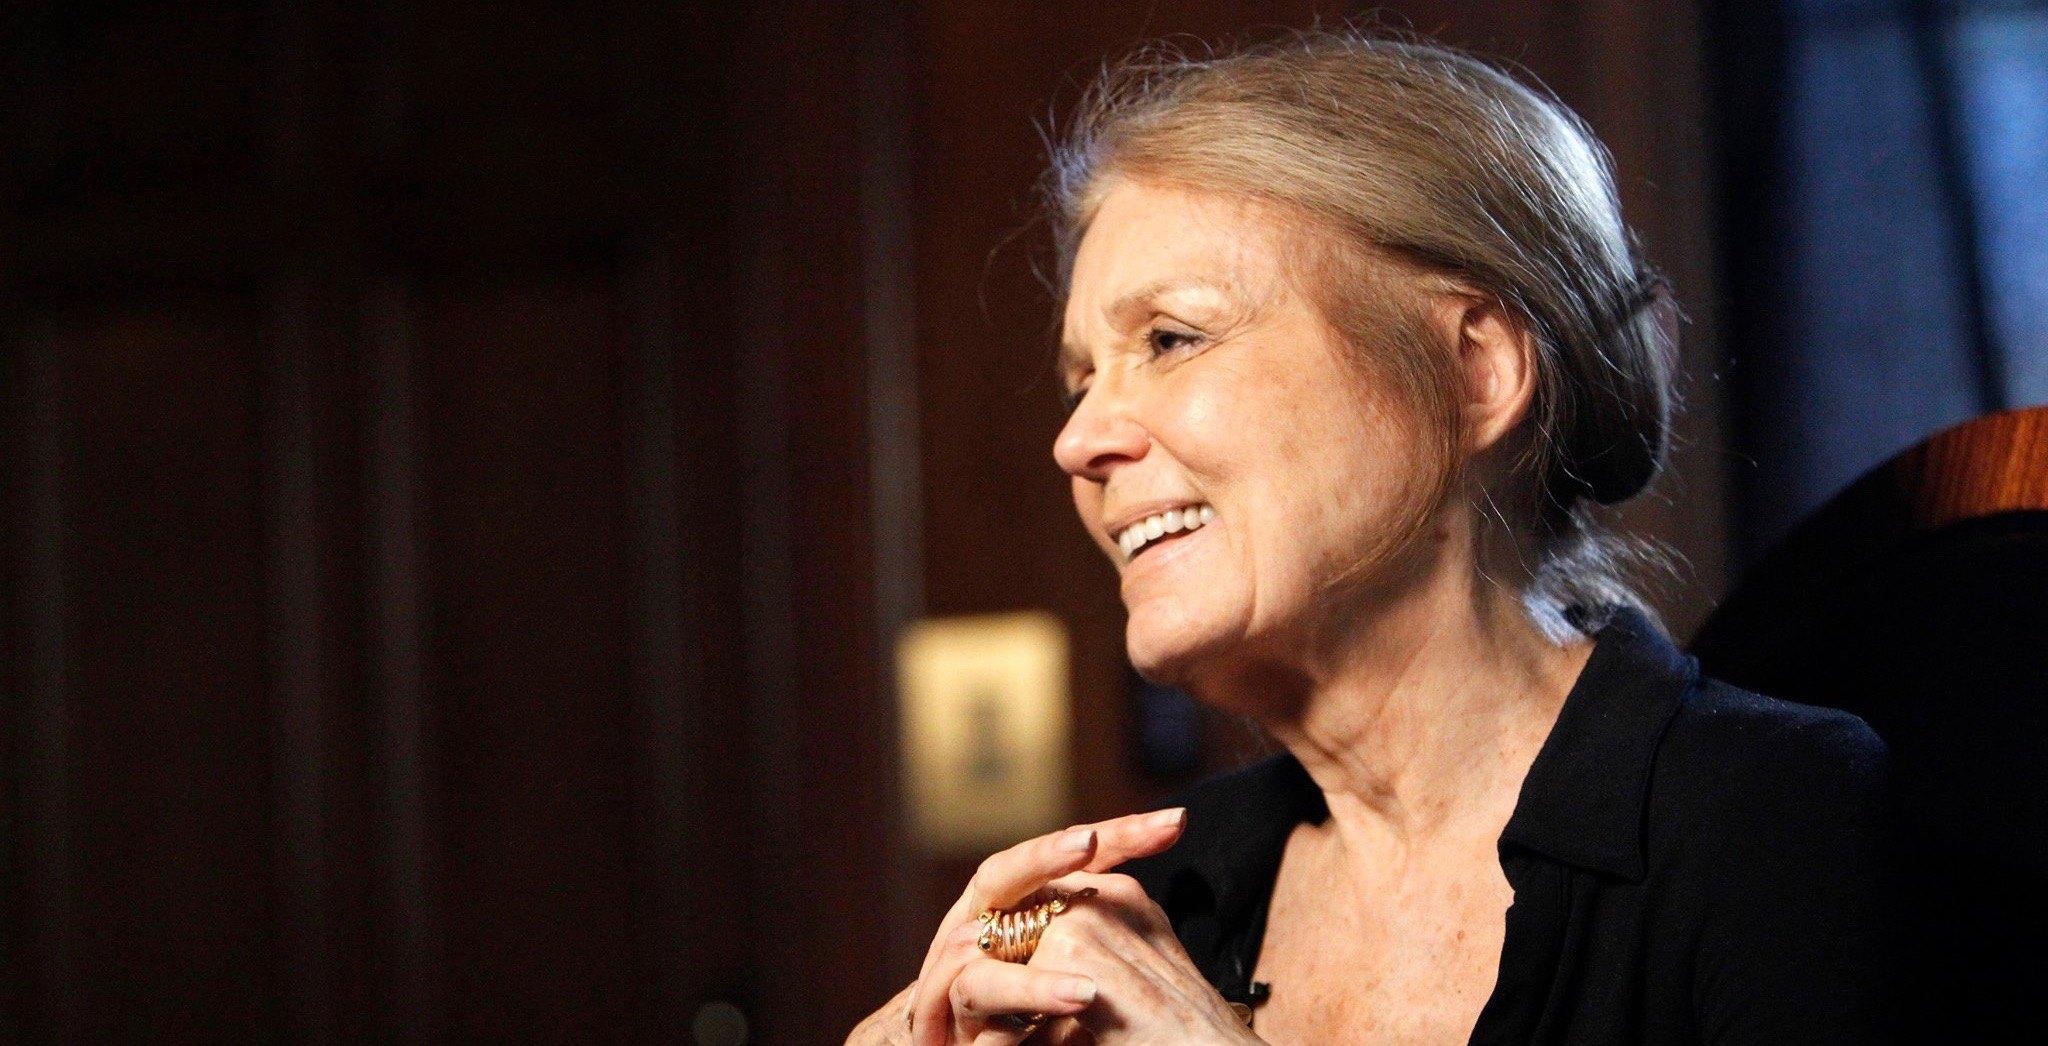 Feminist icon Gloria Steinem will be speaking in Toronto this month